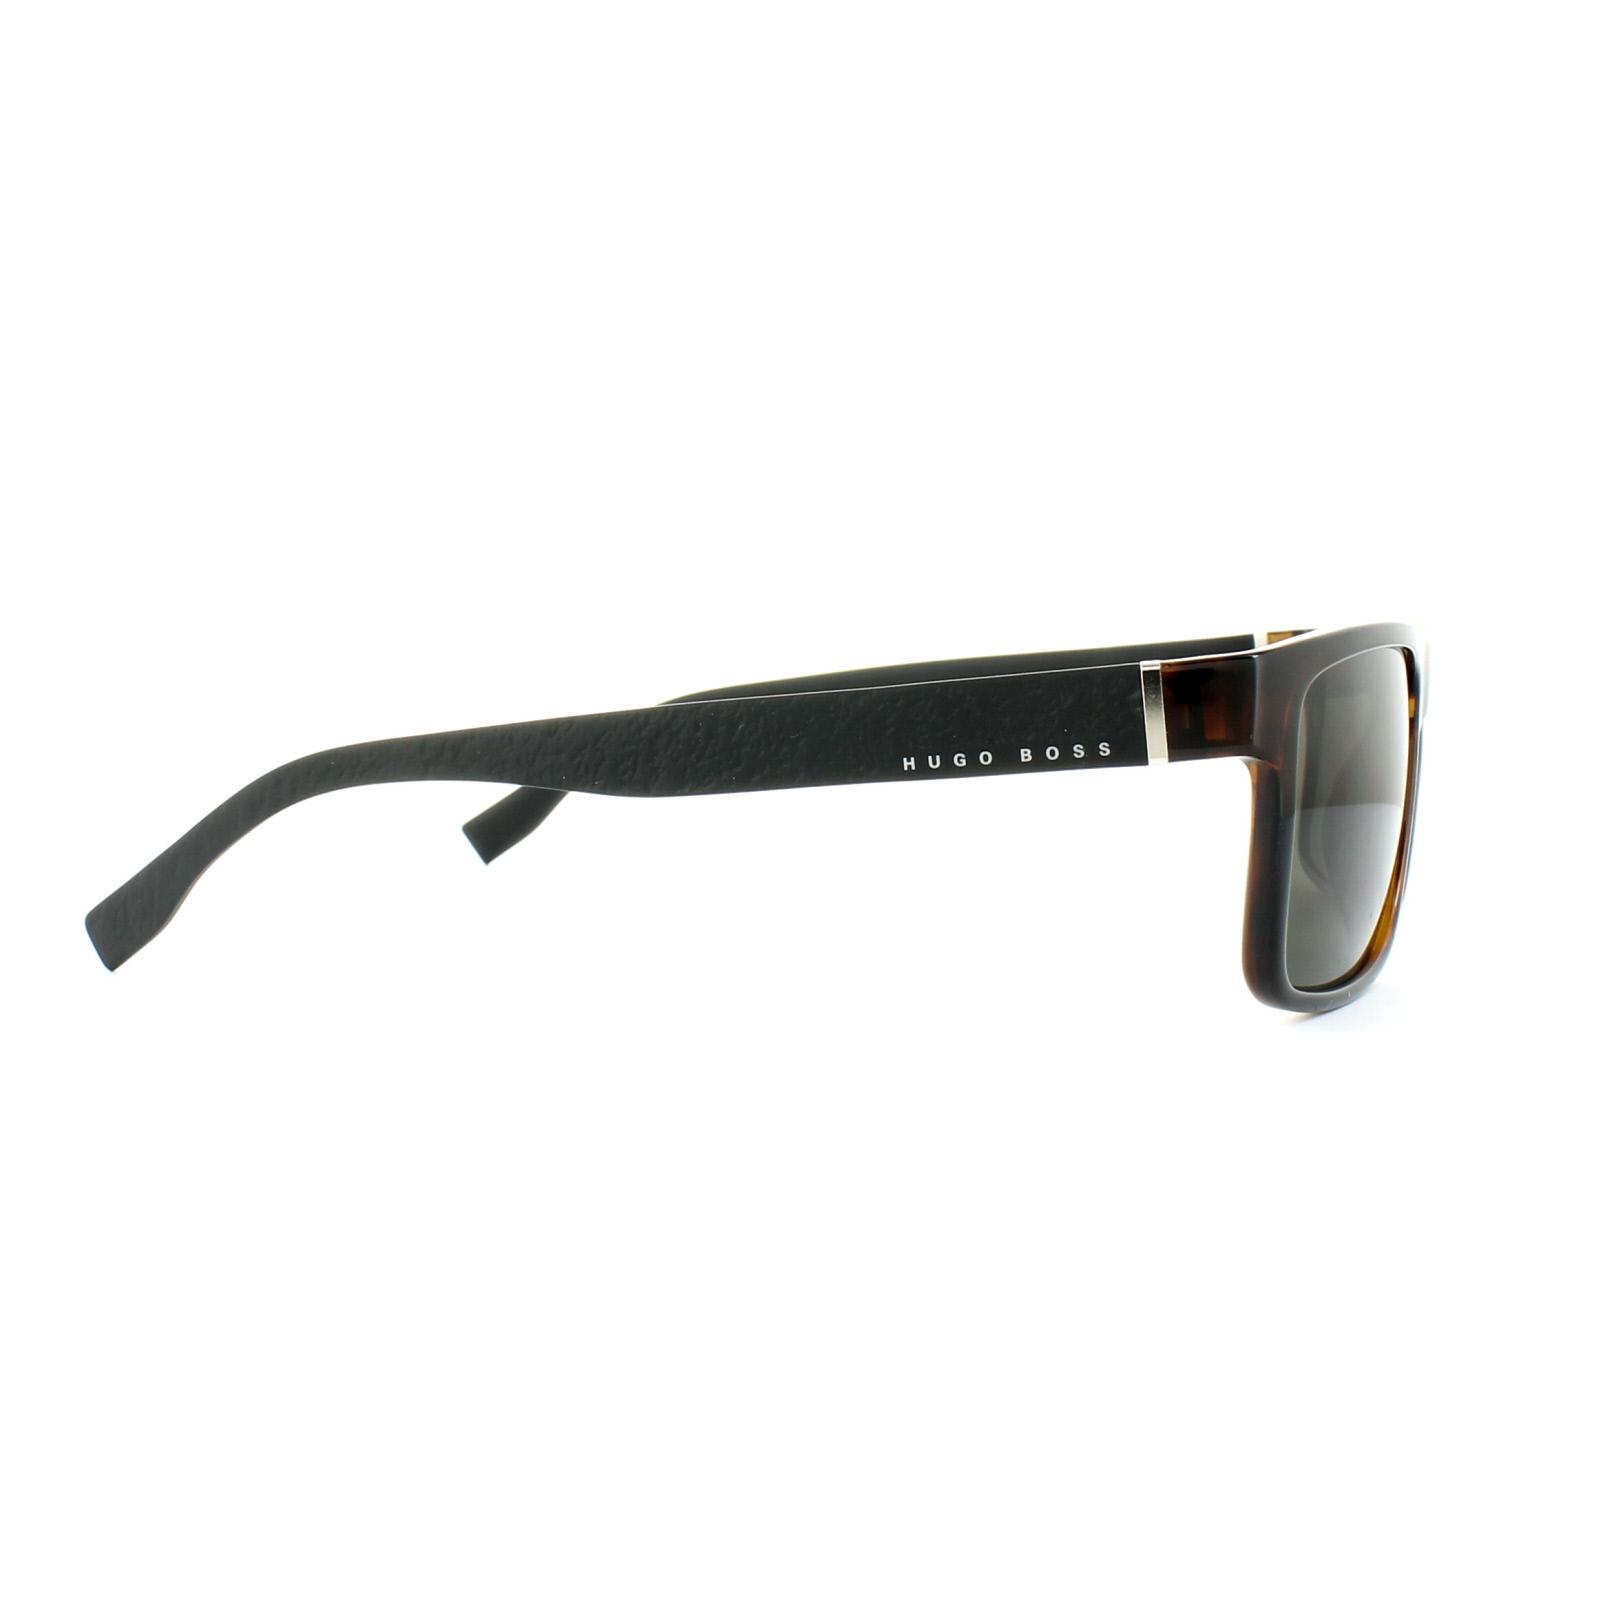 f358cf842b2 Cheap Hugo Boss 0919 Sunglasses - Discounted Sunglasses